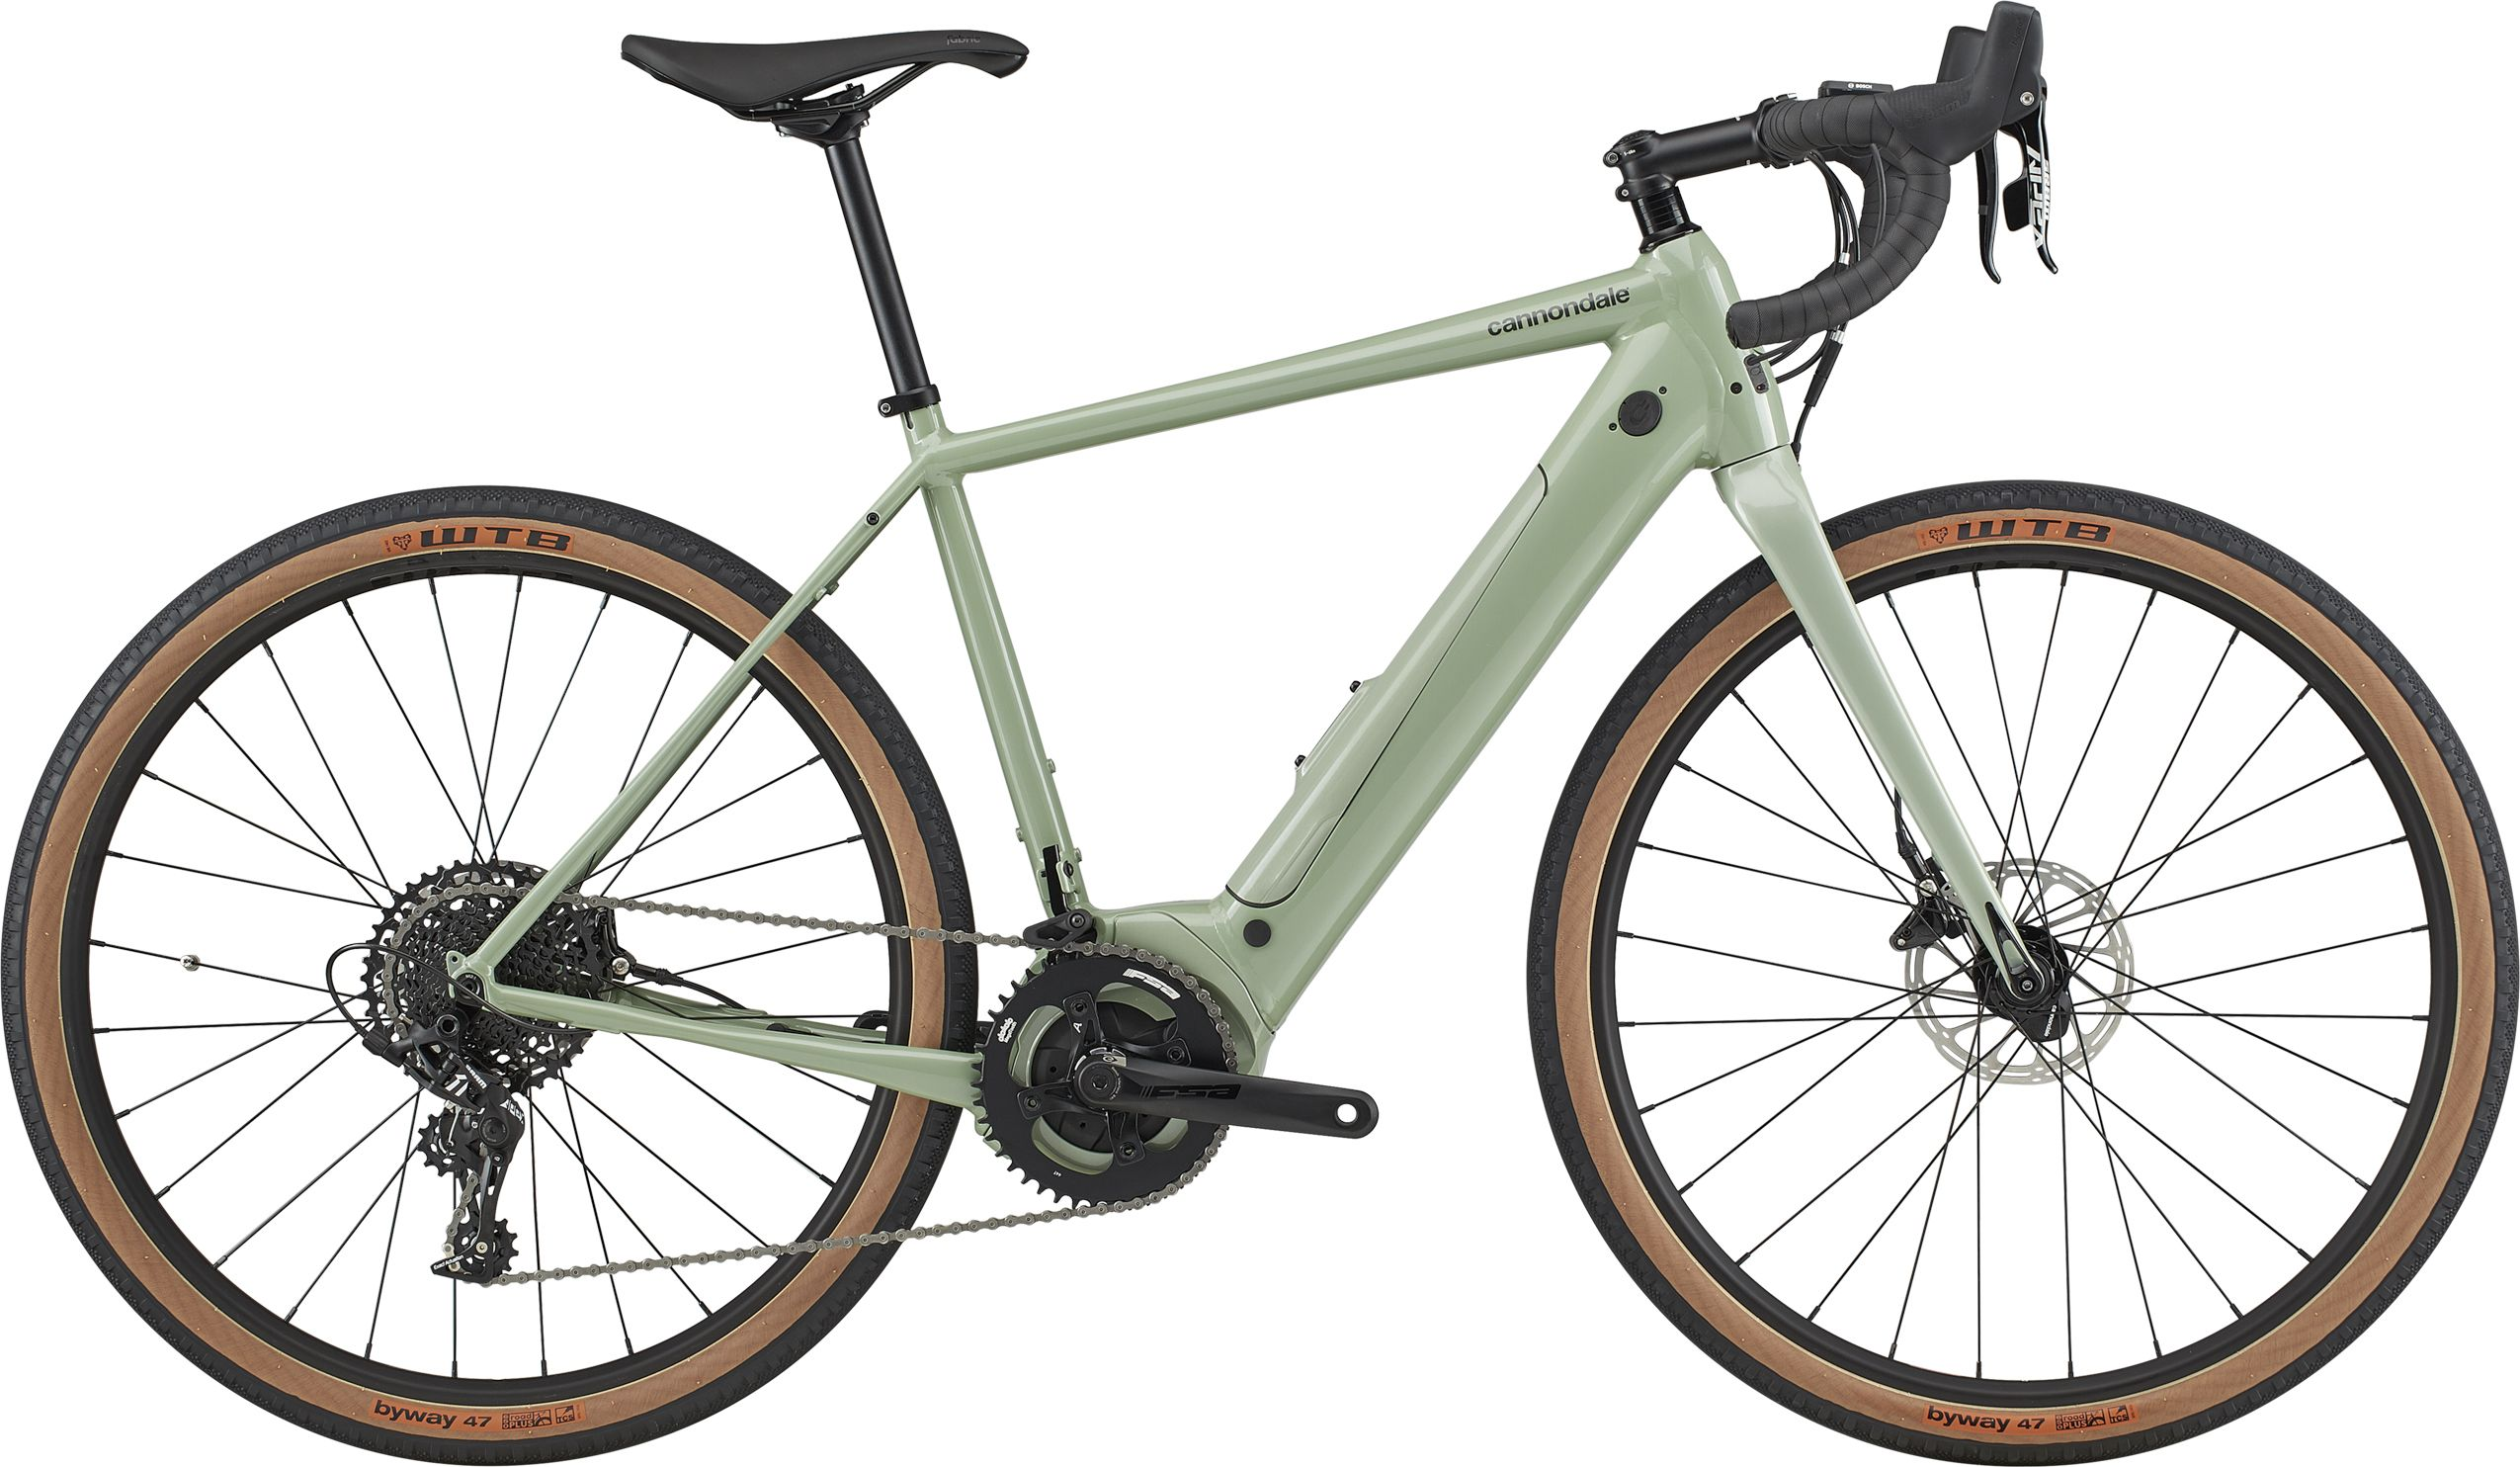 Cannondale Synapse Neo Se 650B Electric Road Bike 2020 | City-cykler